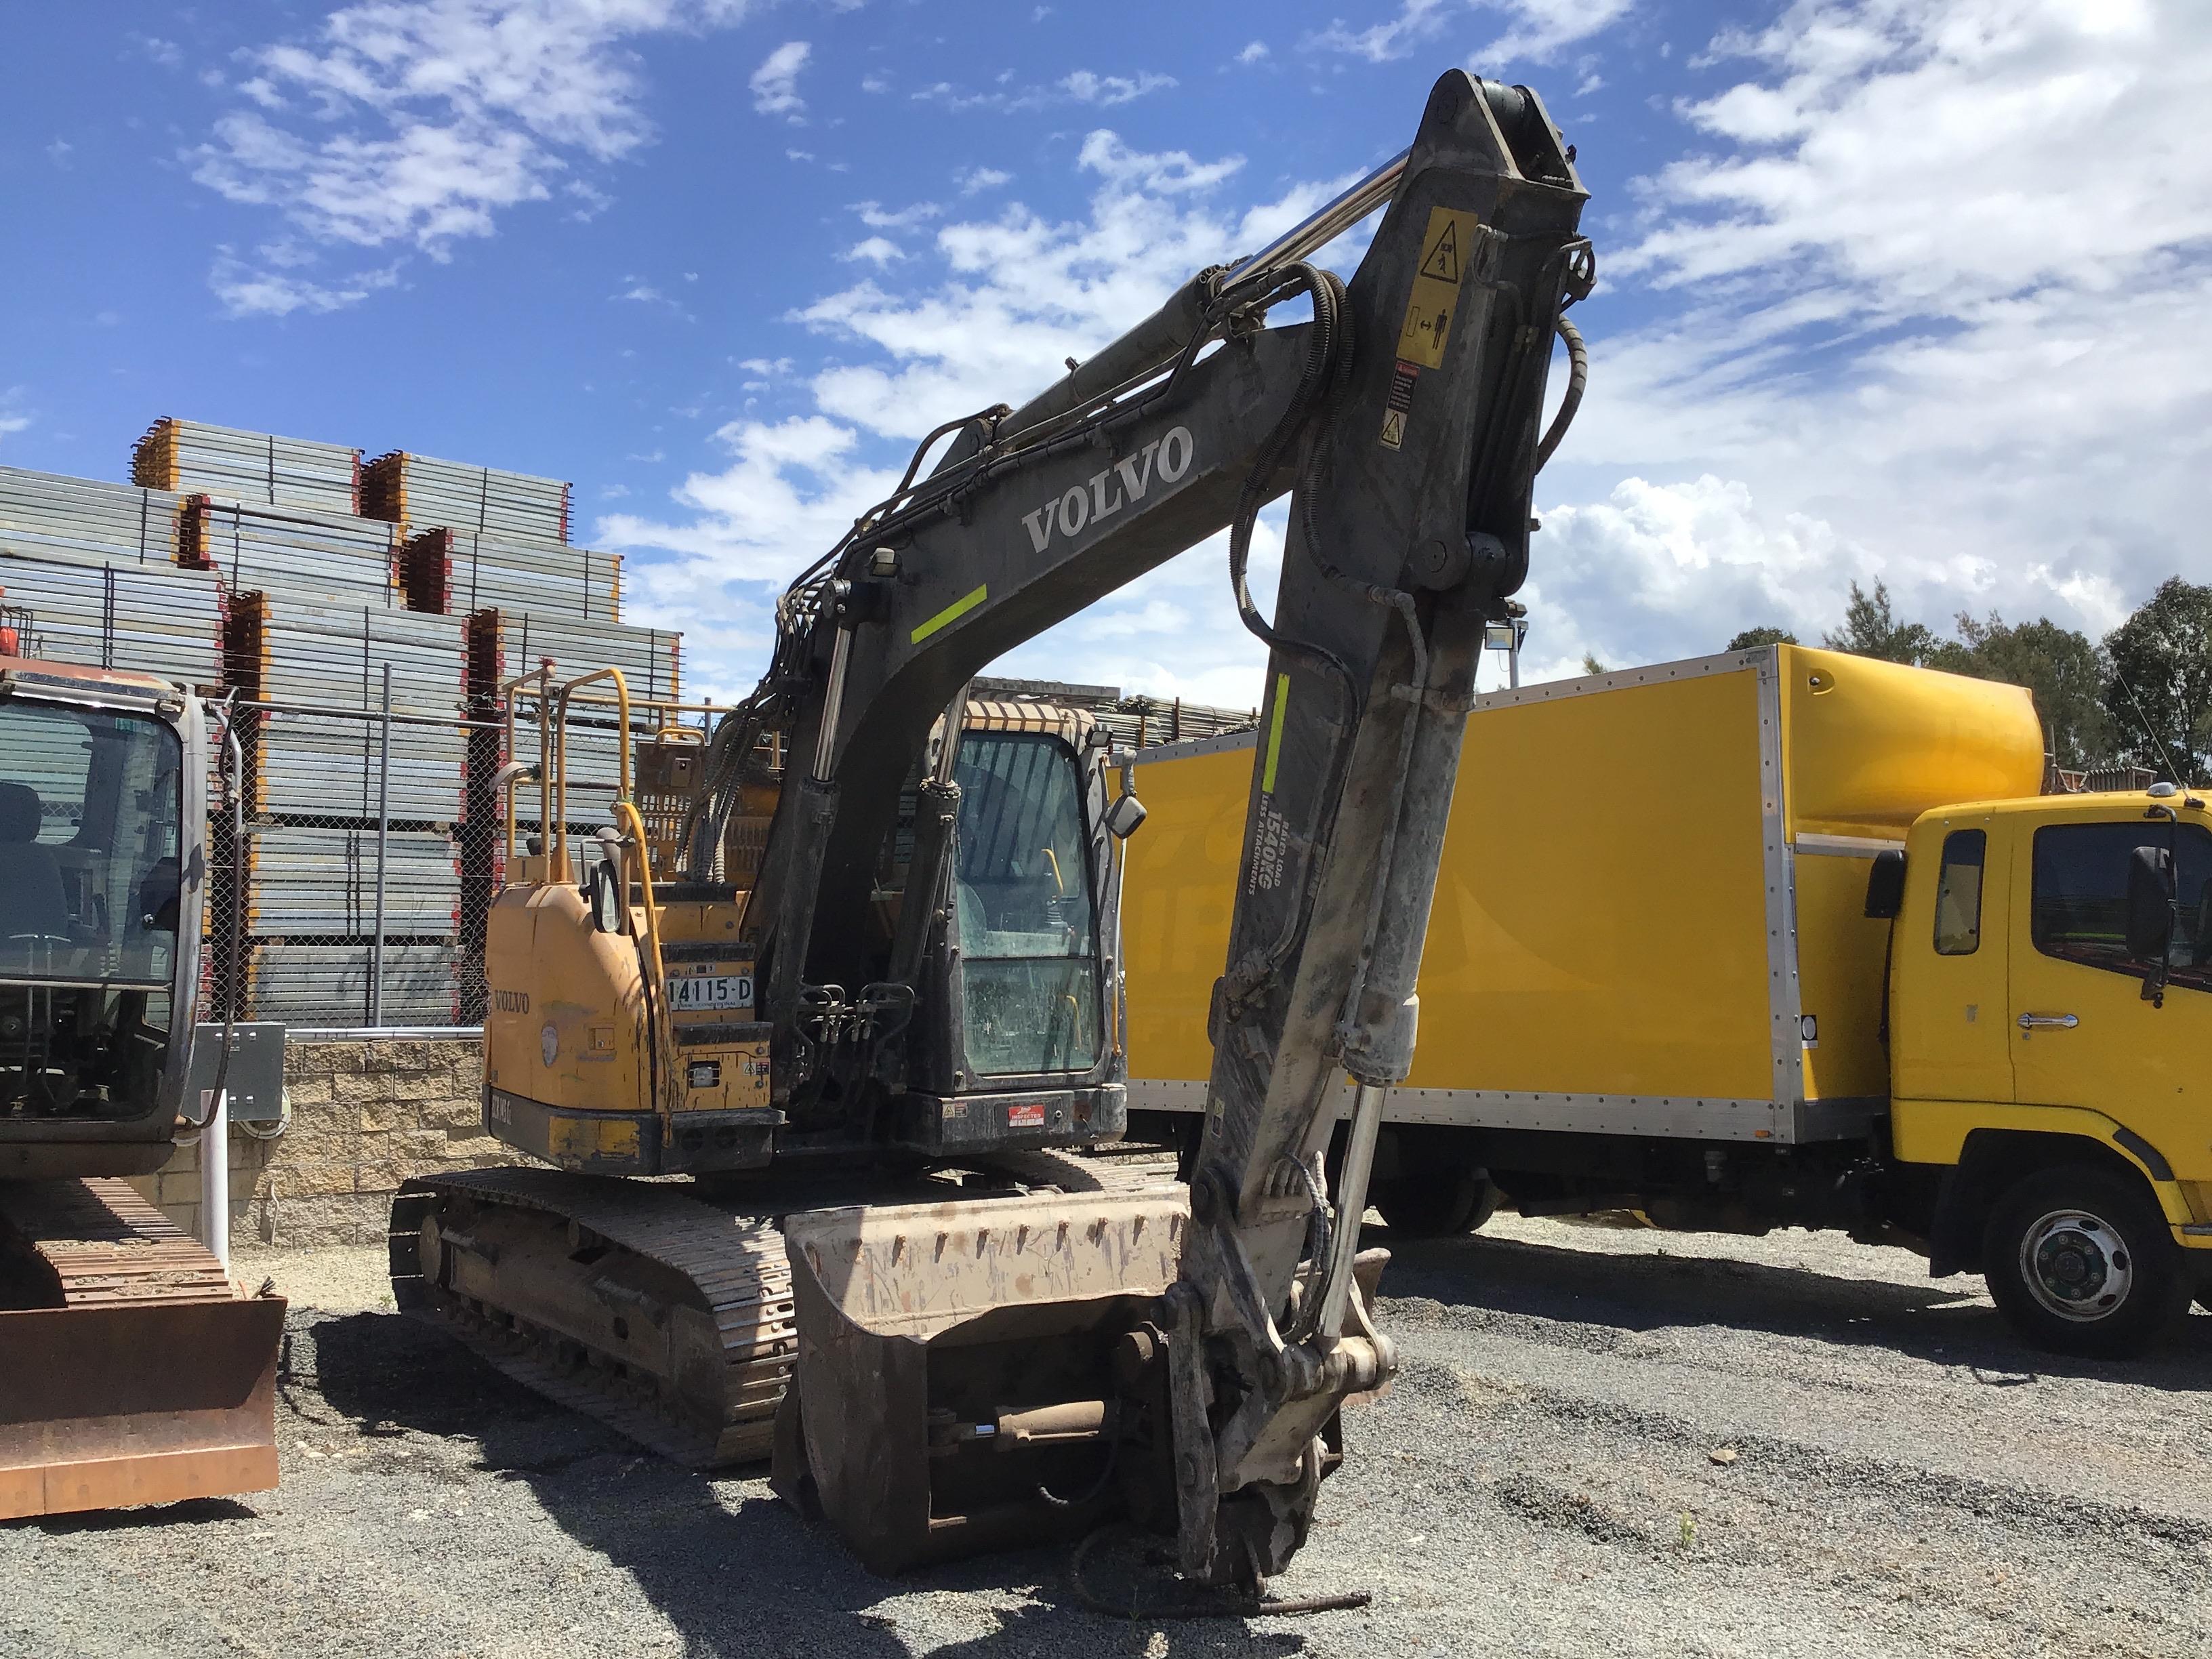 Volvo ECR145 Cl Hydraulic Excavator